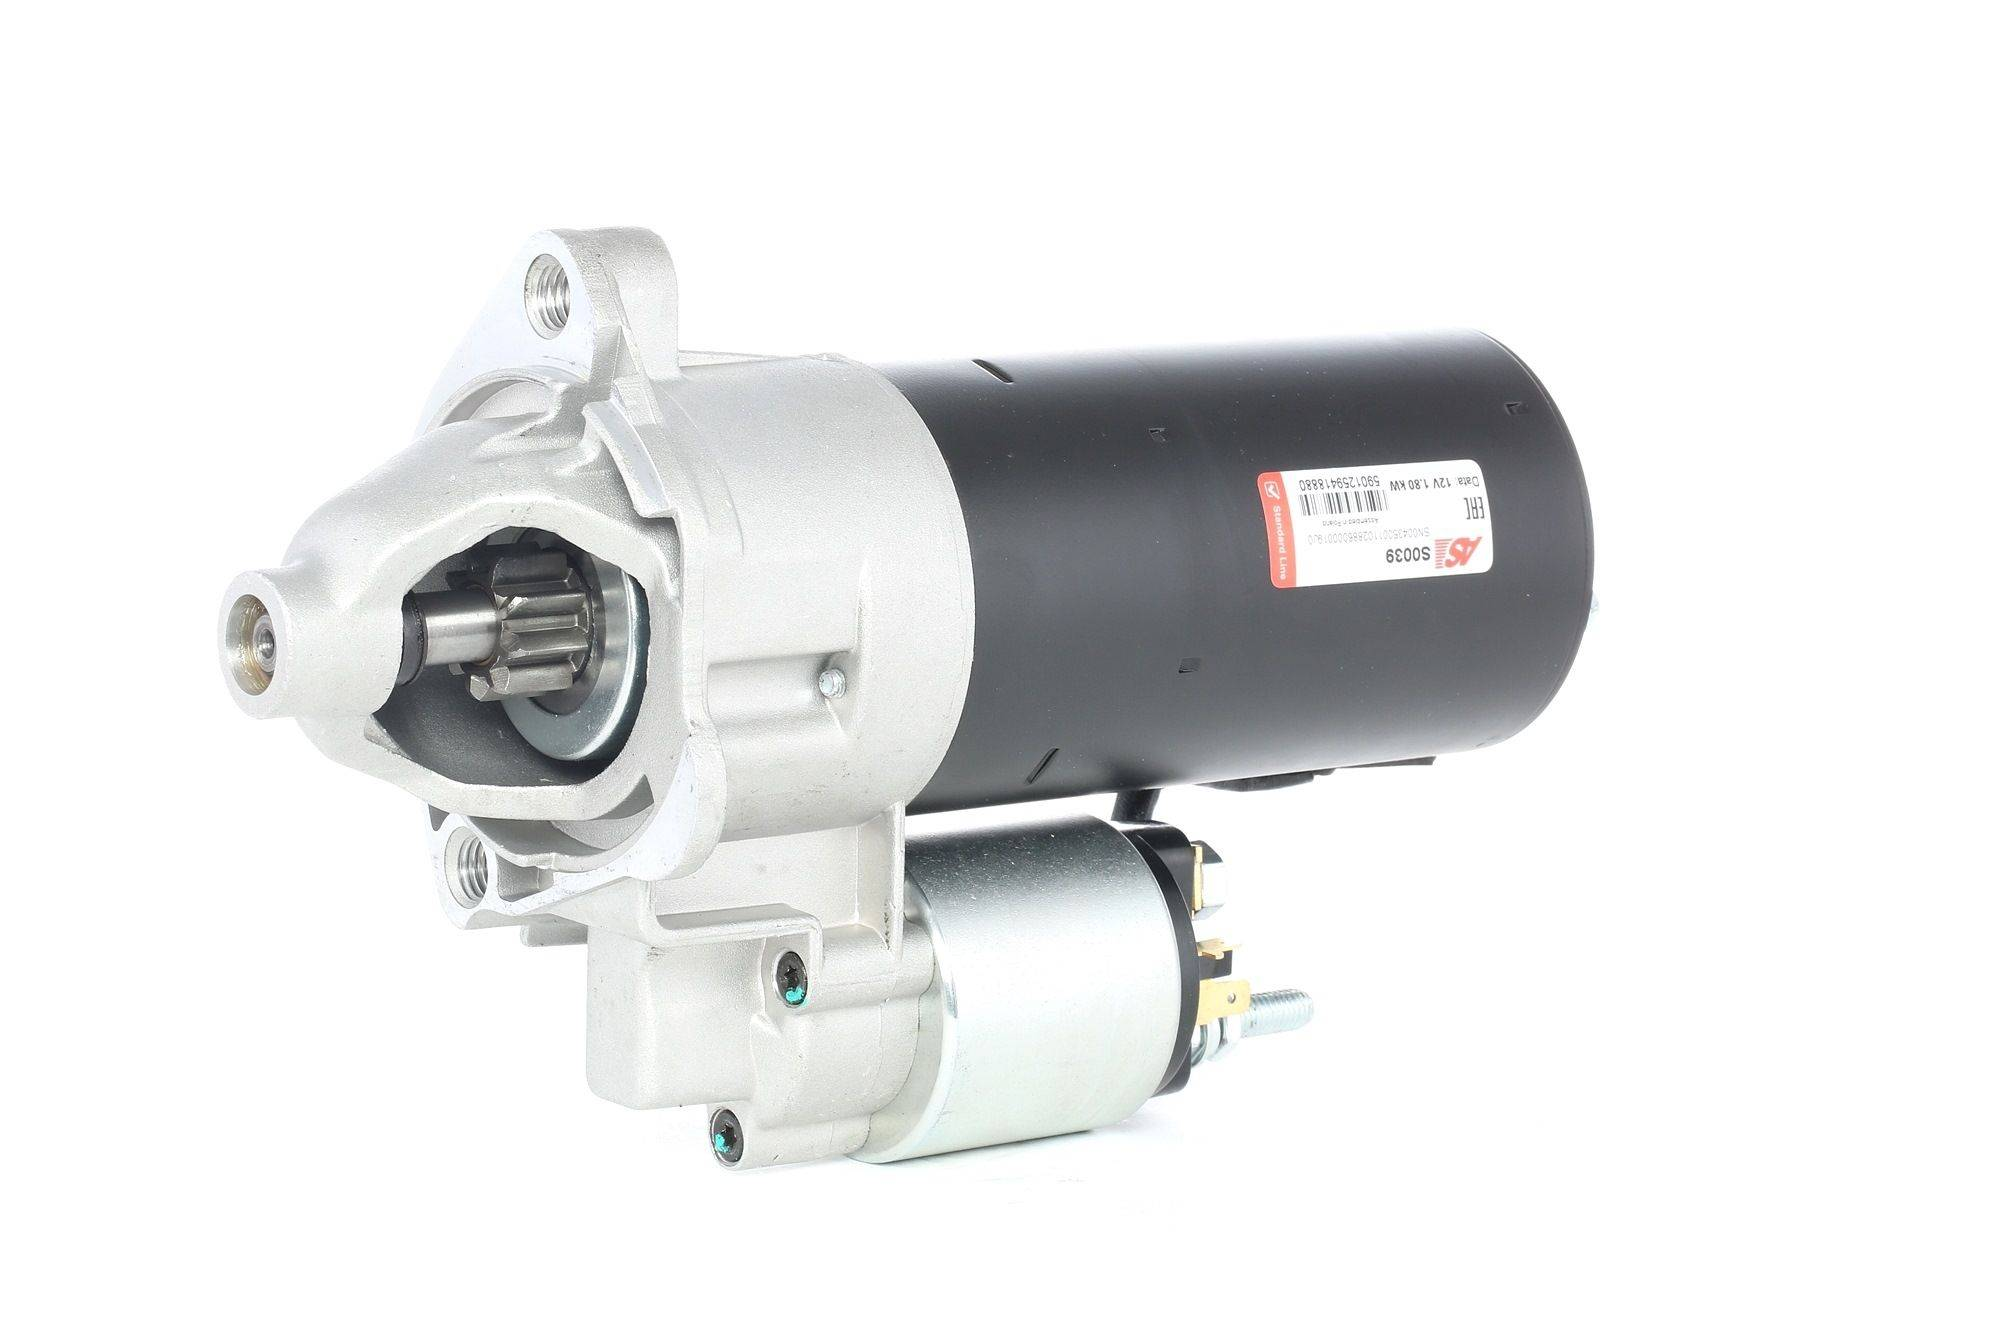 AS-PL Starttimoottori Brand new AS-PL Alternator 63377492 S0039 Startti,Käynnistinmoottori MULTICAR,M25,M26